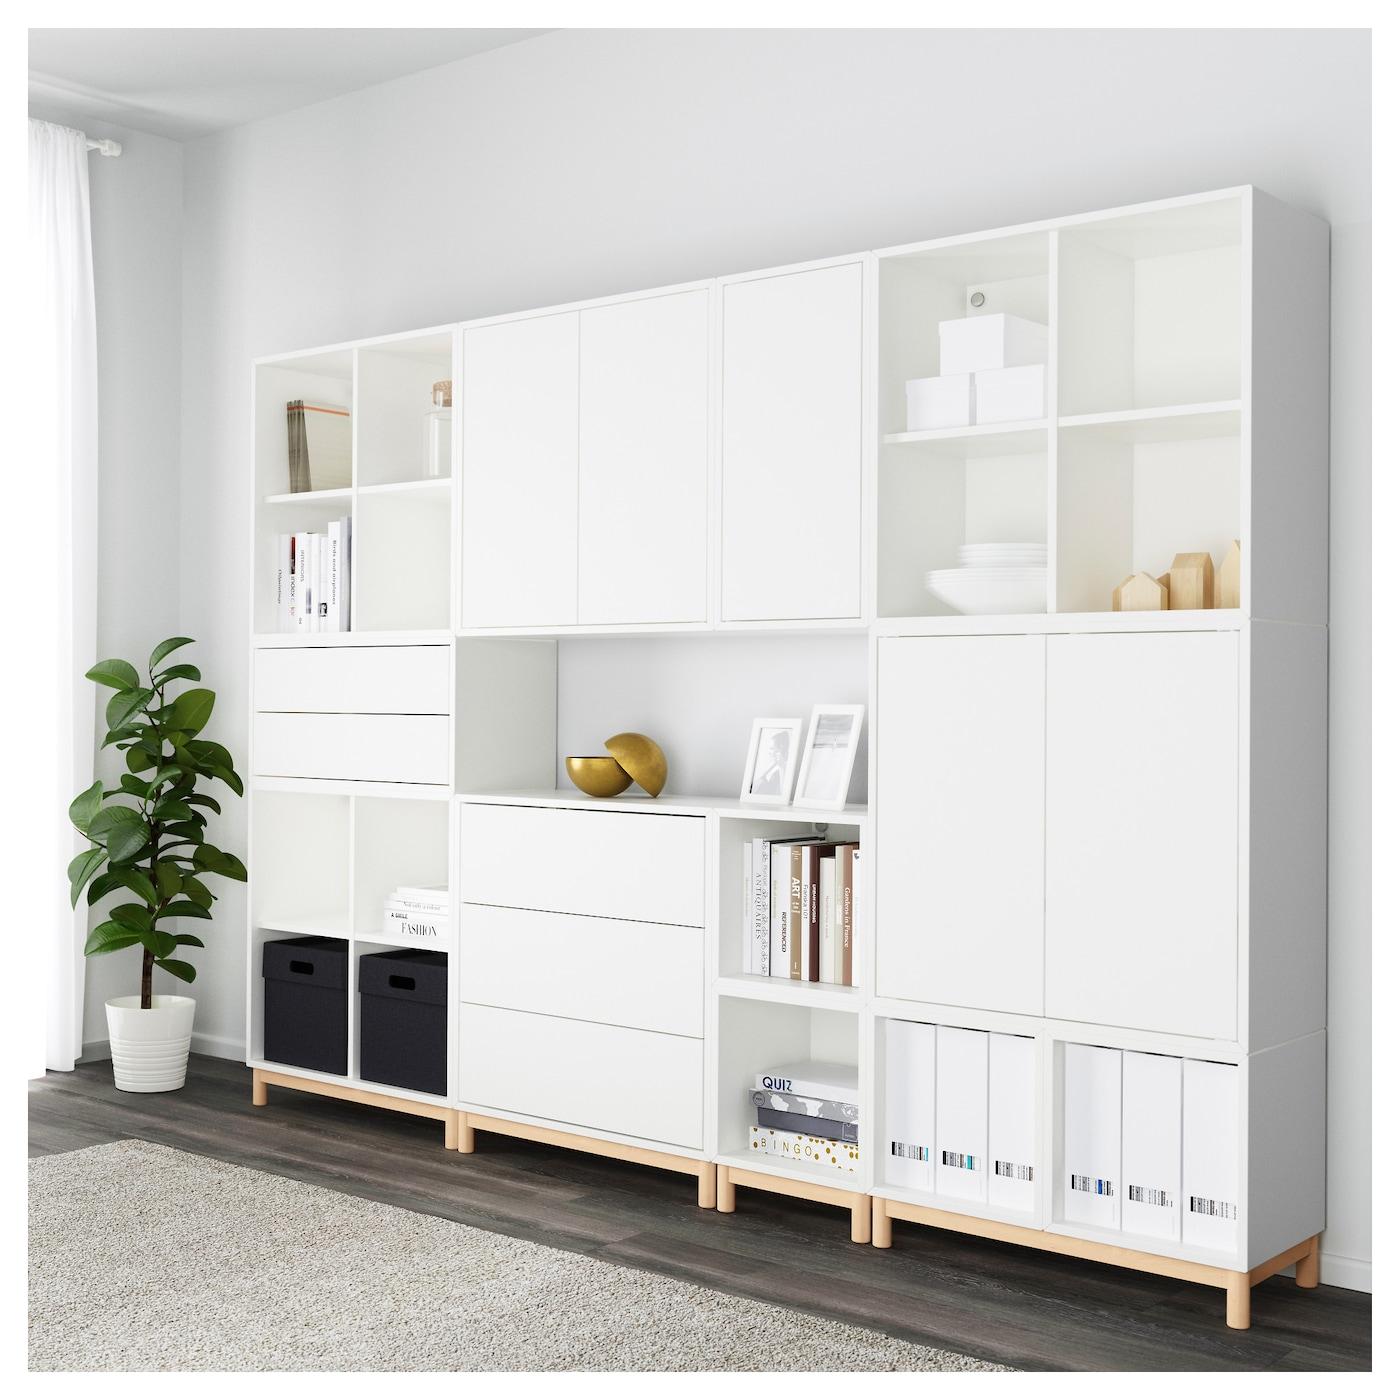 eket cabinet combination with legs white 245 x 35 x 185 cm ikea. Black Bedroom Furniture Sets. Home Design Ideas